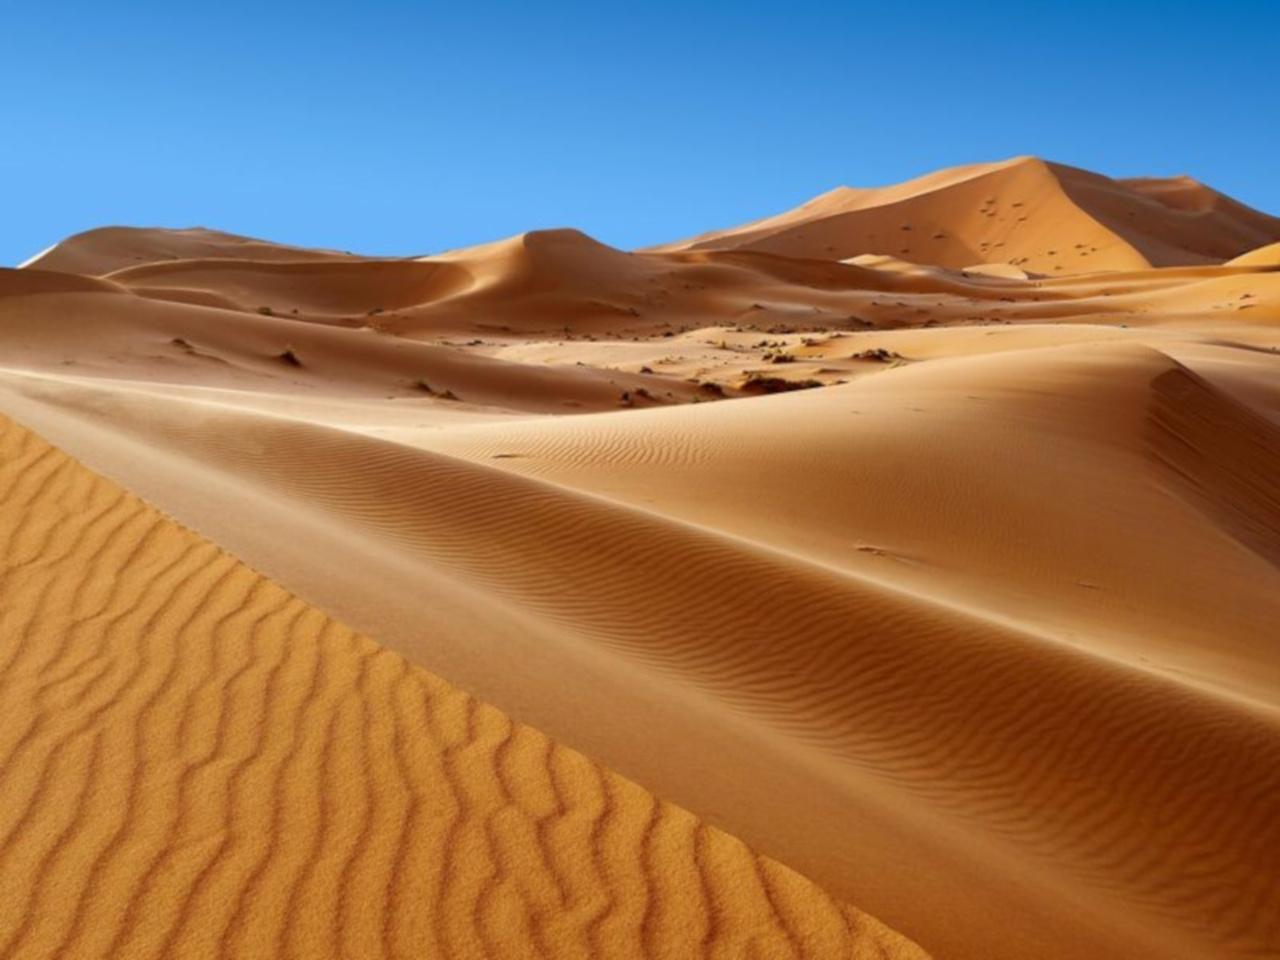 Gadoufaua il cimitero dei dinosauri nel deserto Ténéré